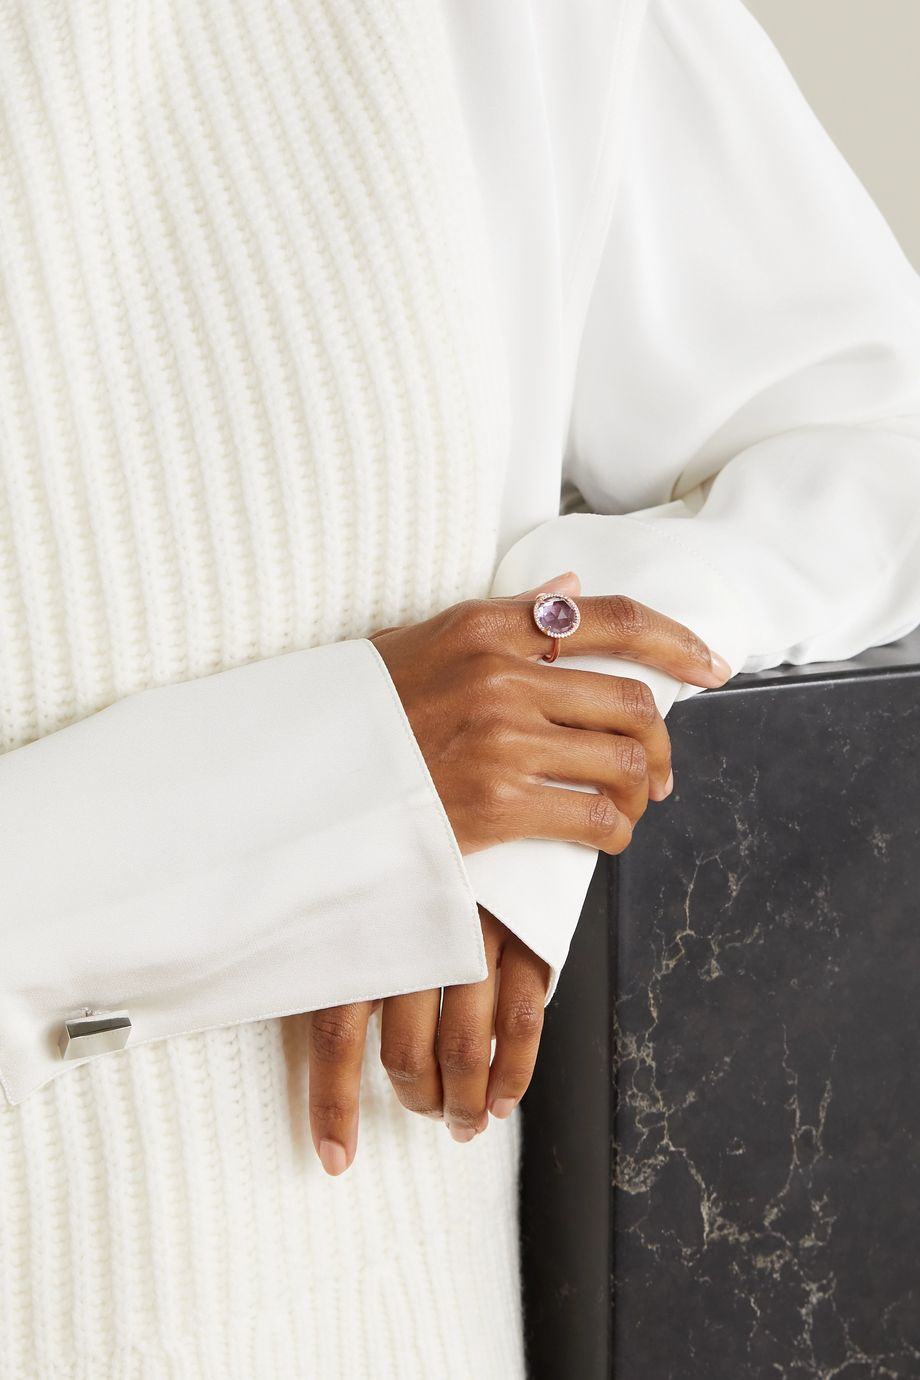 Irene Neuwirth Classic 18-karat rose gold, amethyst and diamond ring